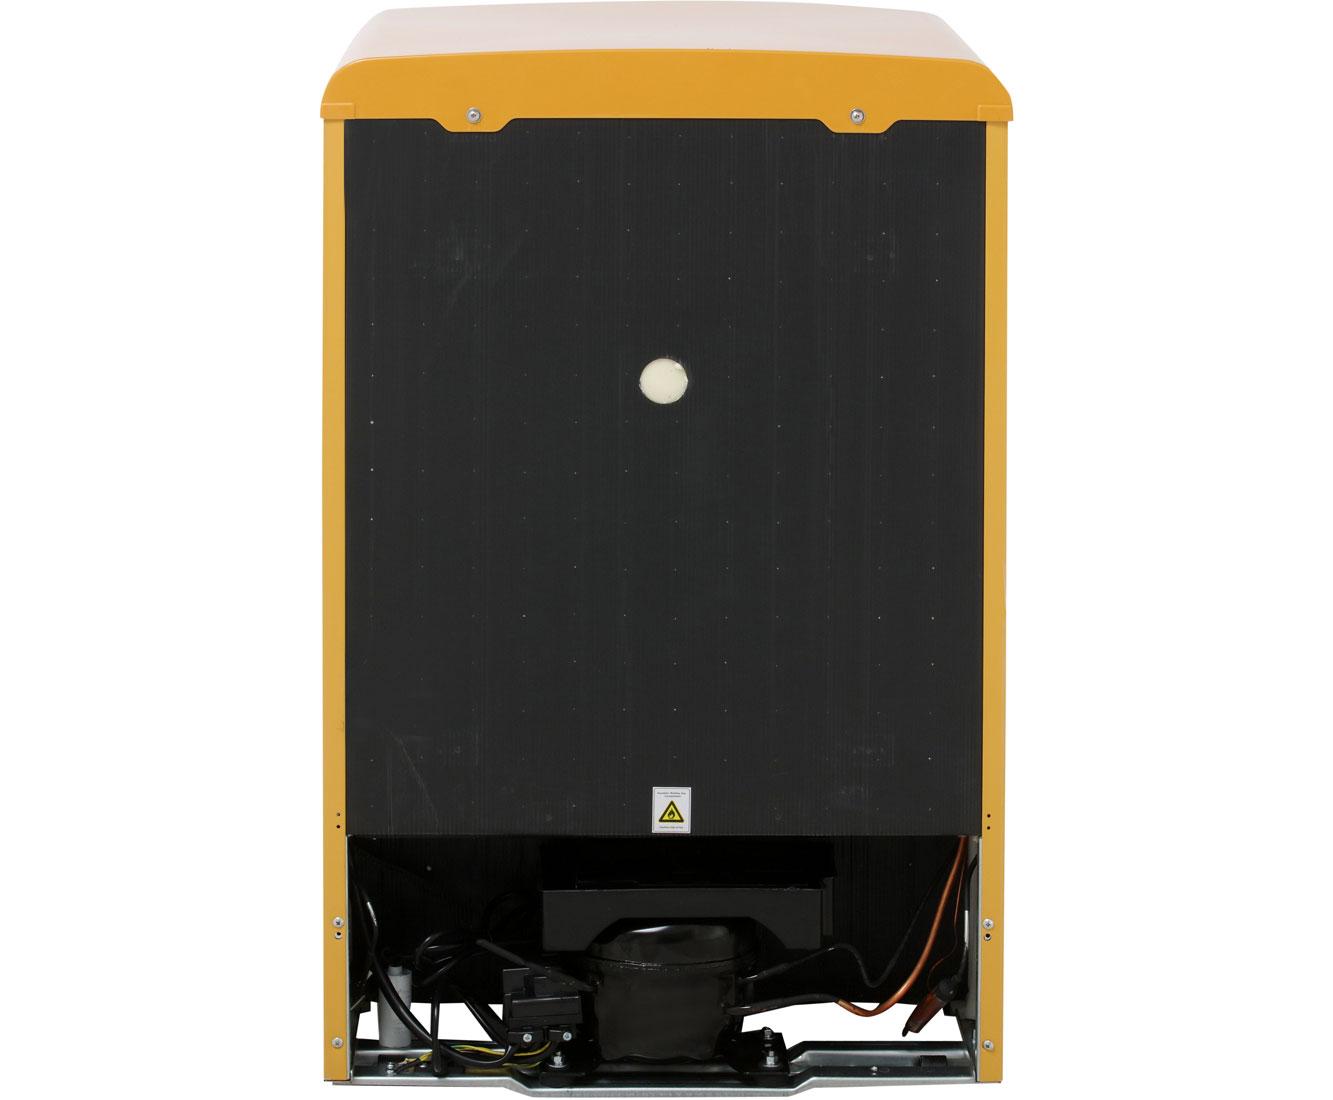 Kühlschrank Design Retro : Smeg retro kuhlschrank design gunstig ebay kuehlschrank